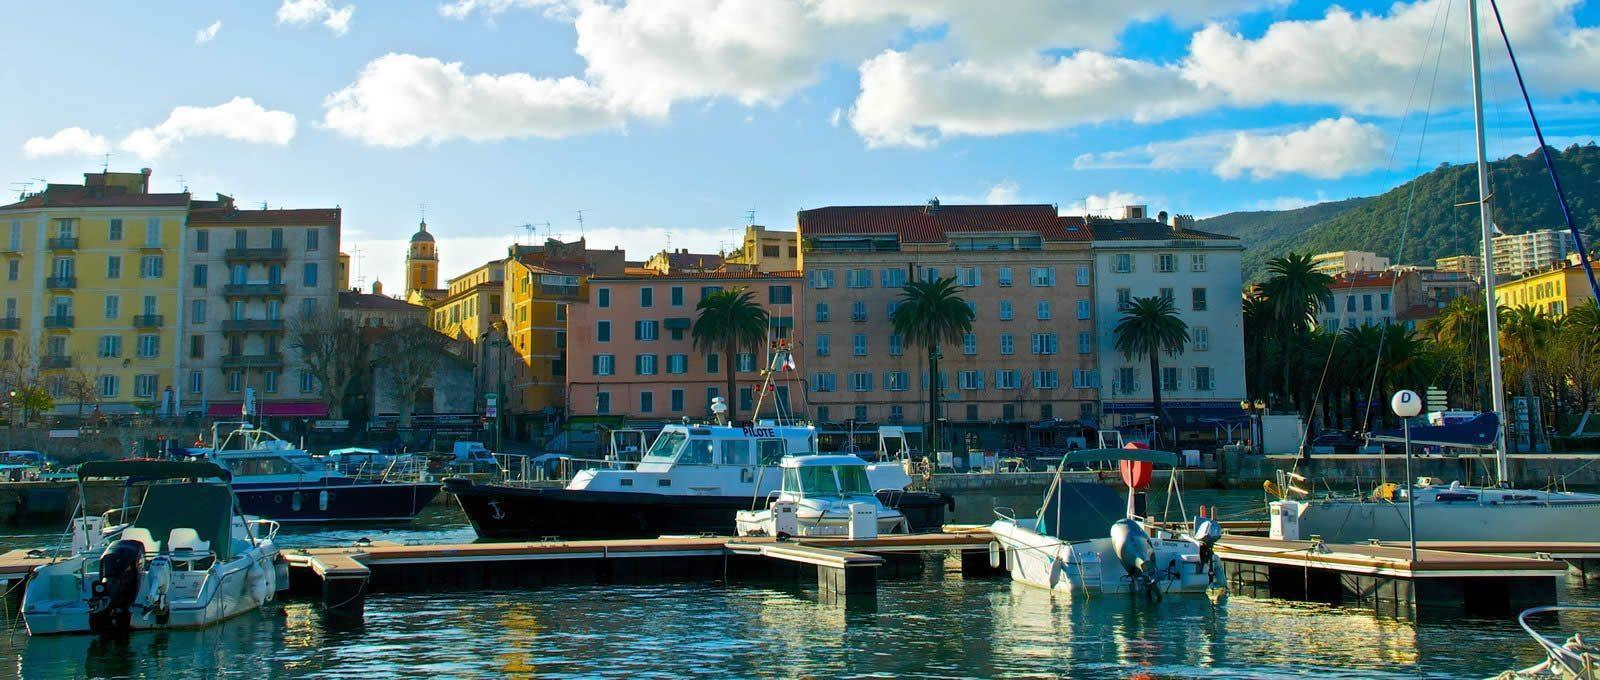 acheter-appartement-ajaccio-immeubles-anciens-constructions-neuves-opportunites-immobilieres